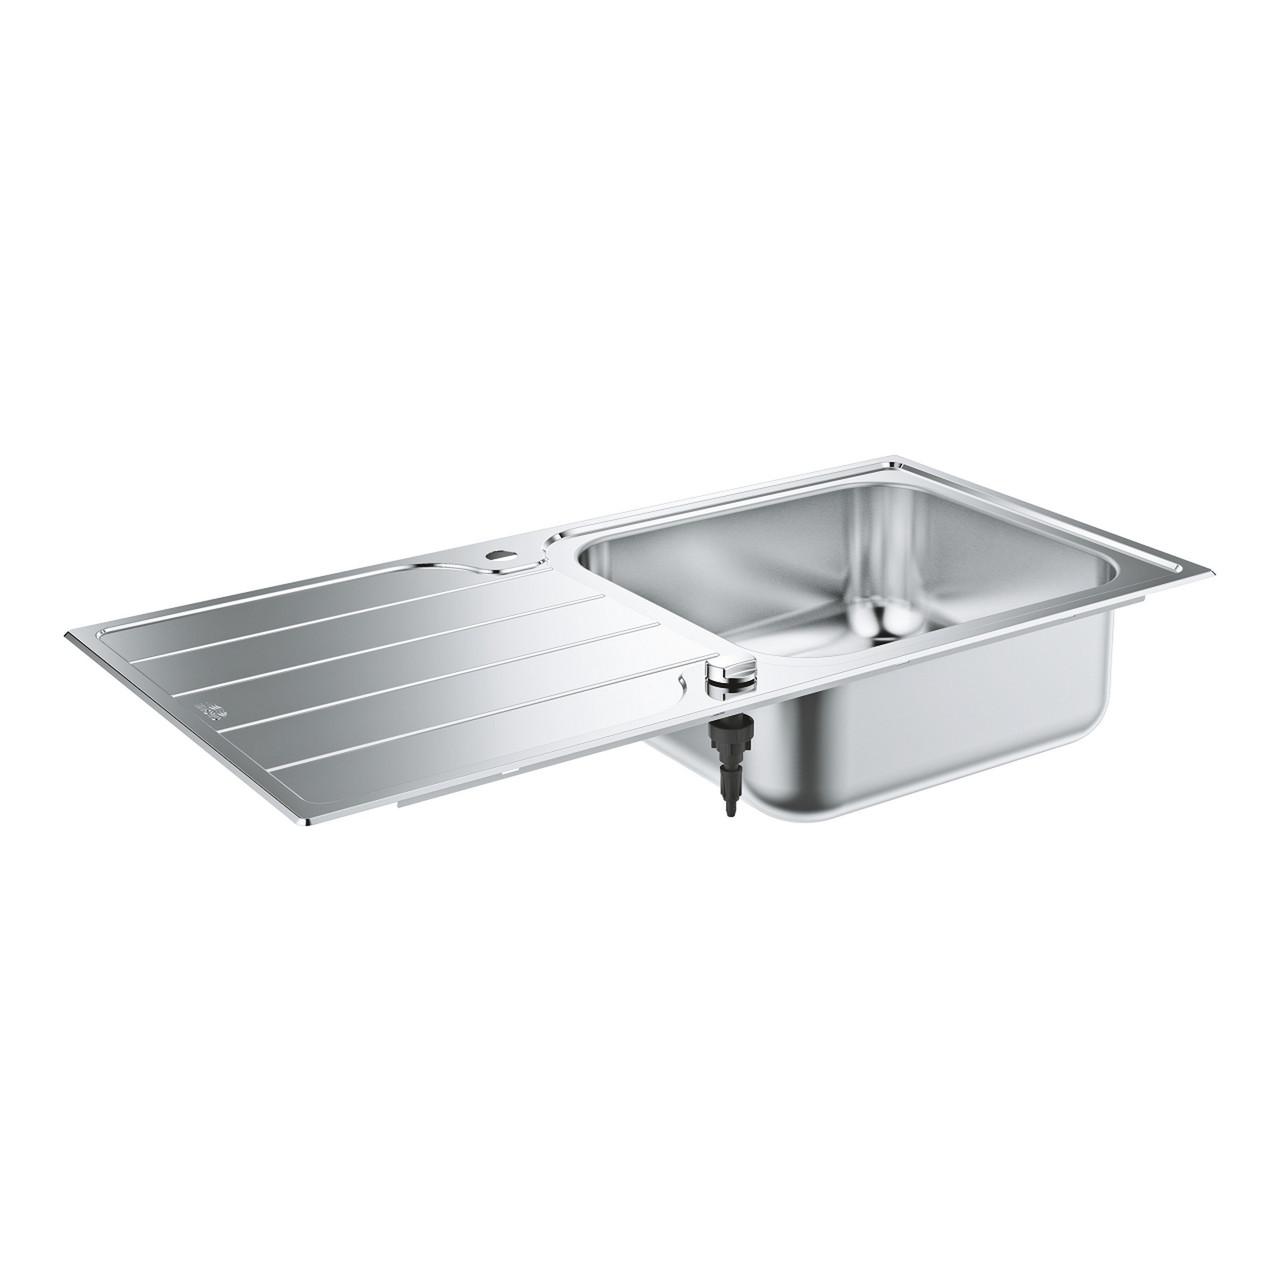 Кухонная мойка Grohe Sink K500 31563SD1